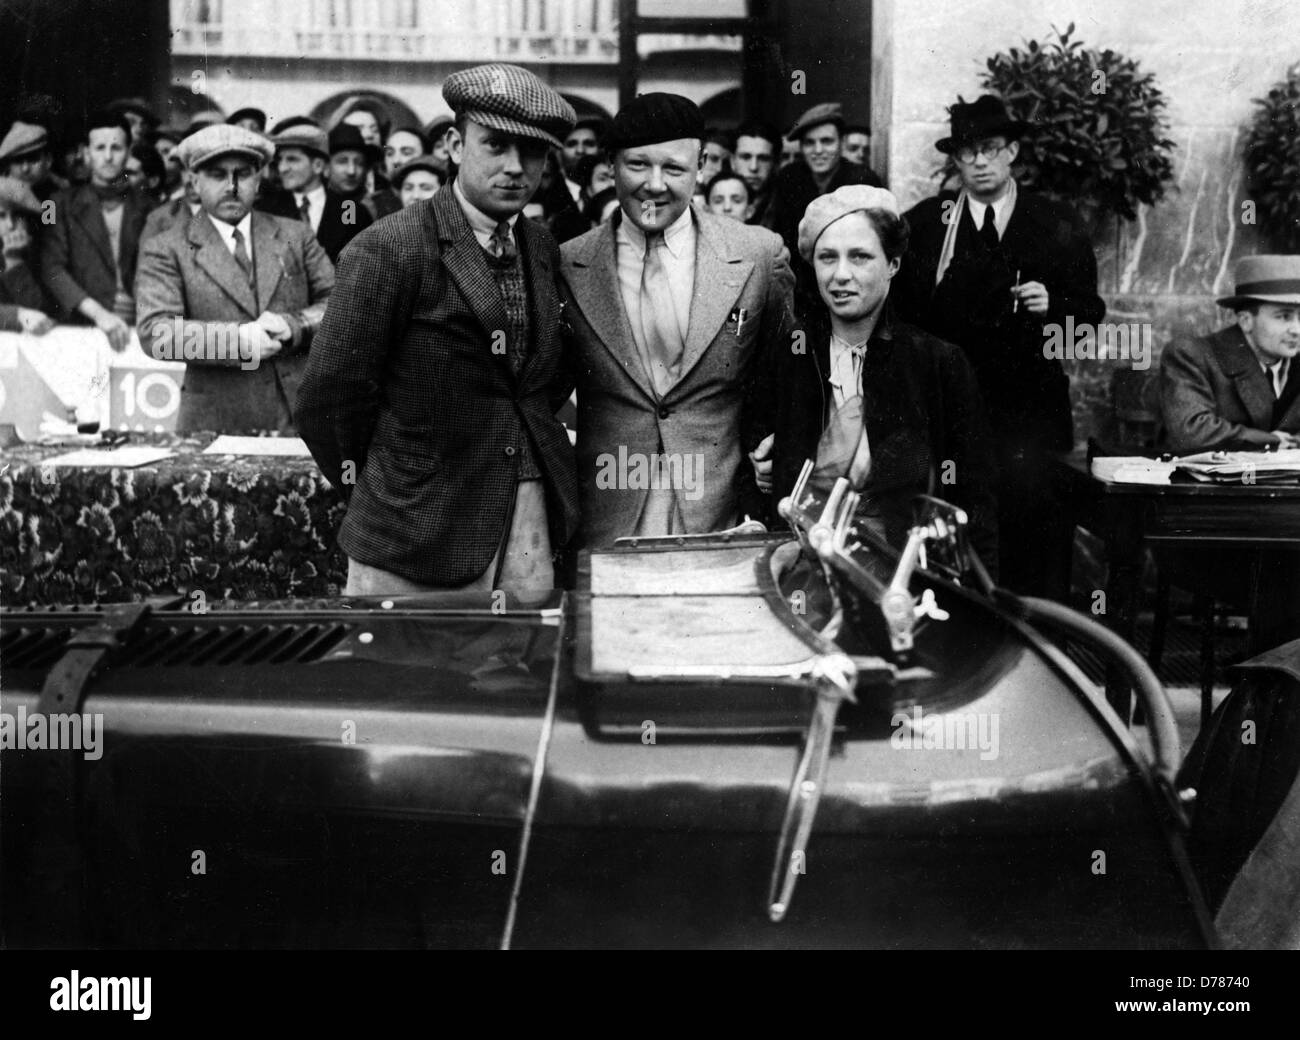 Mille Miglia 1934 MG Magnette Eddie Hall (middle) - Stock Image